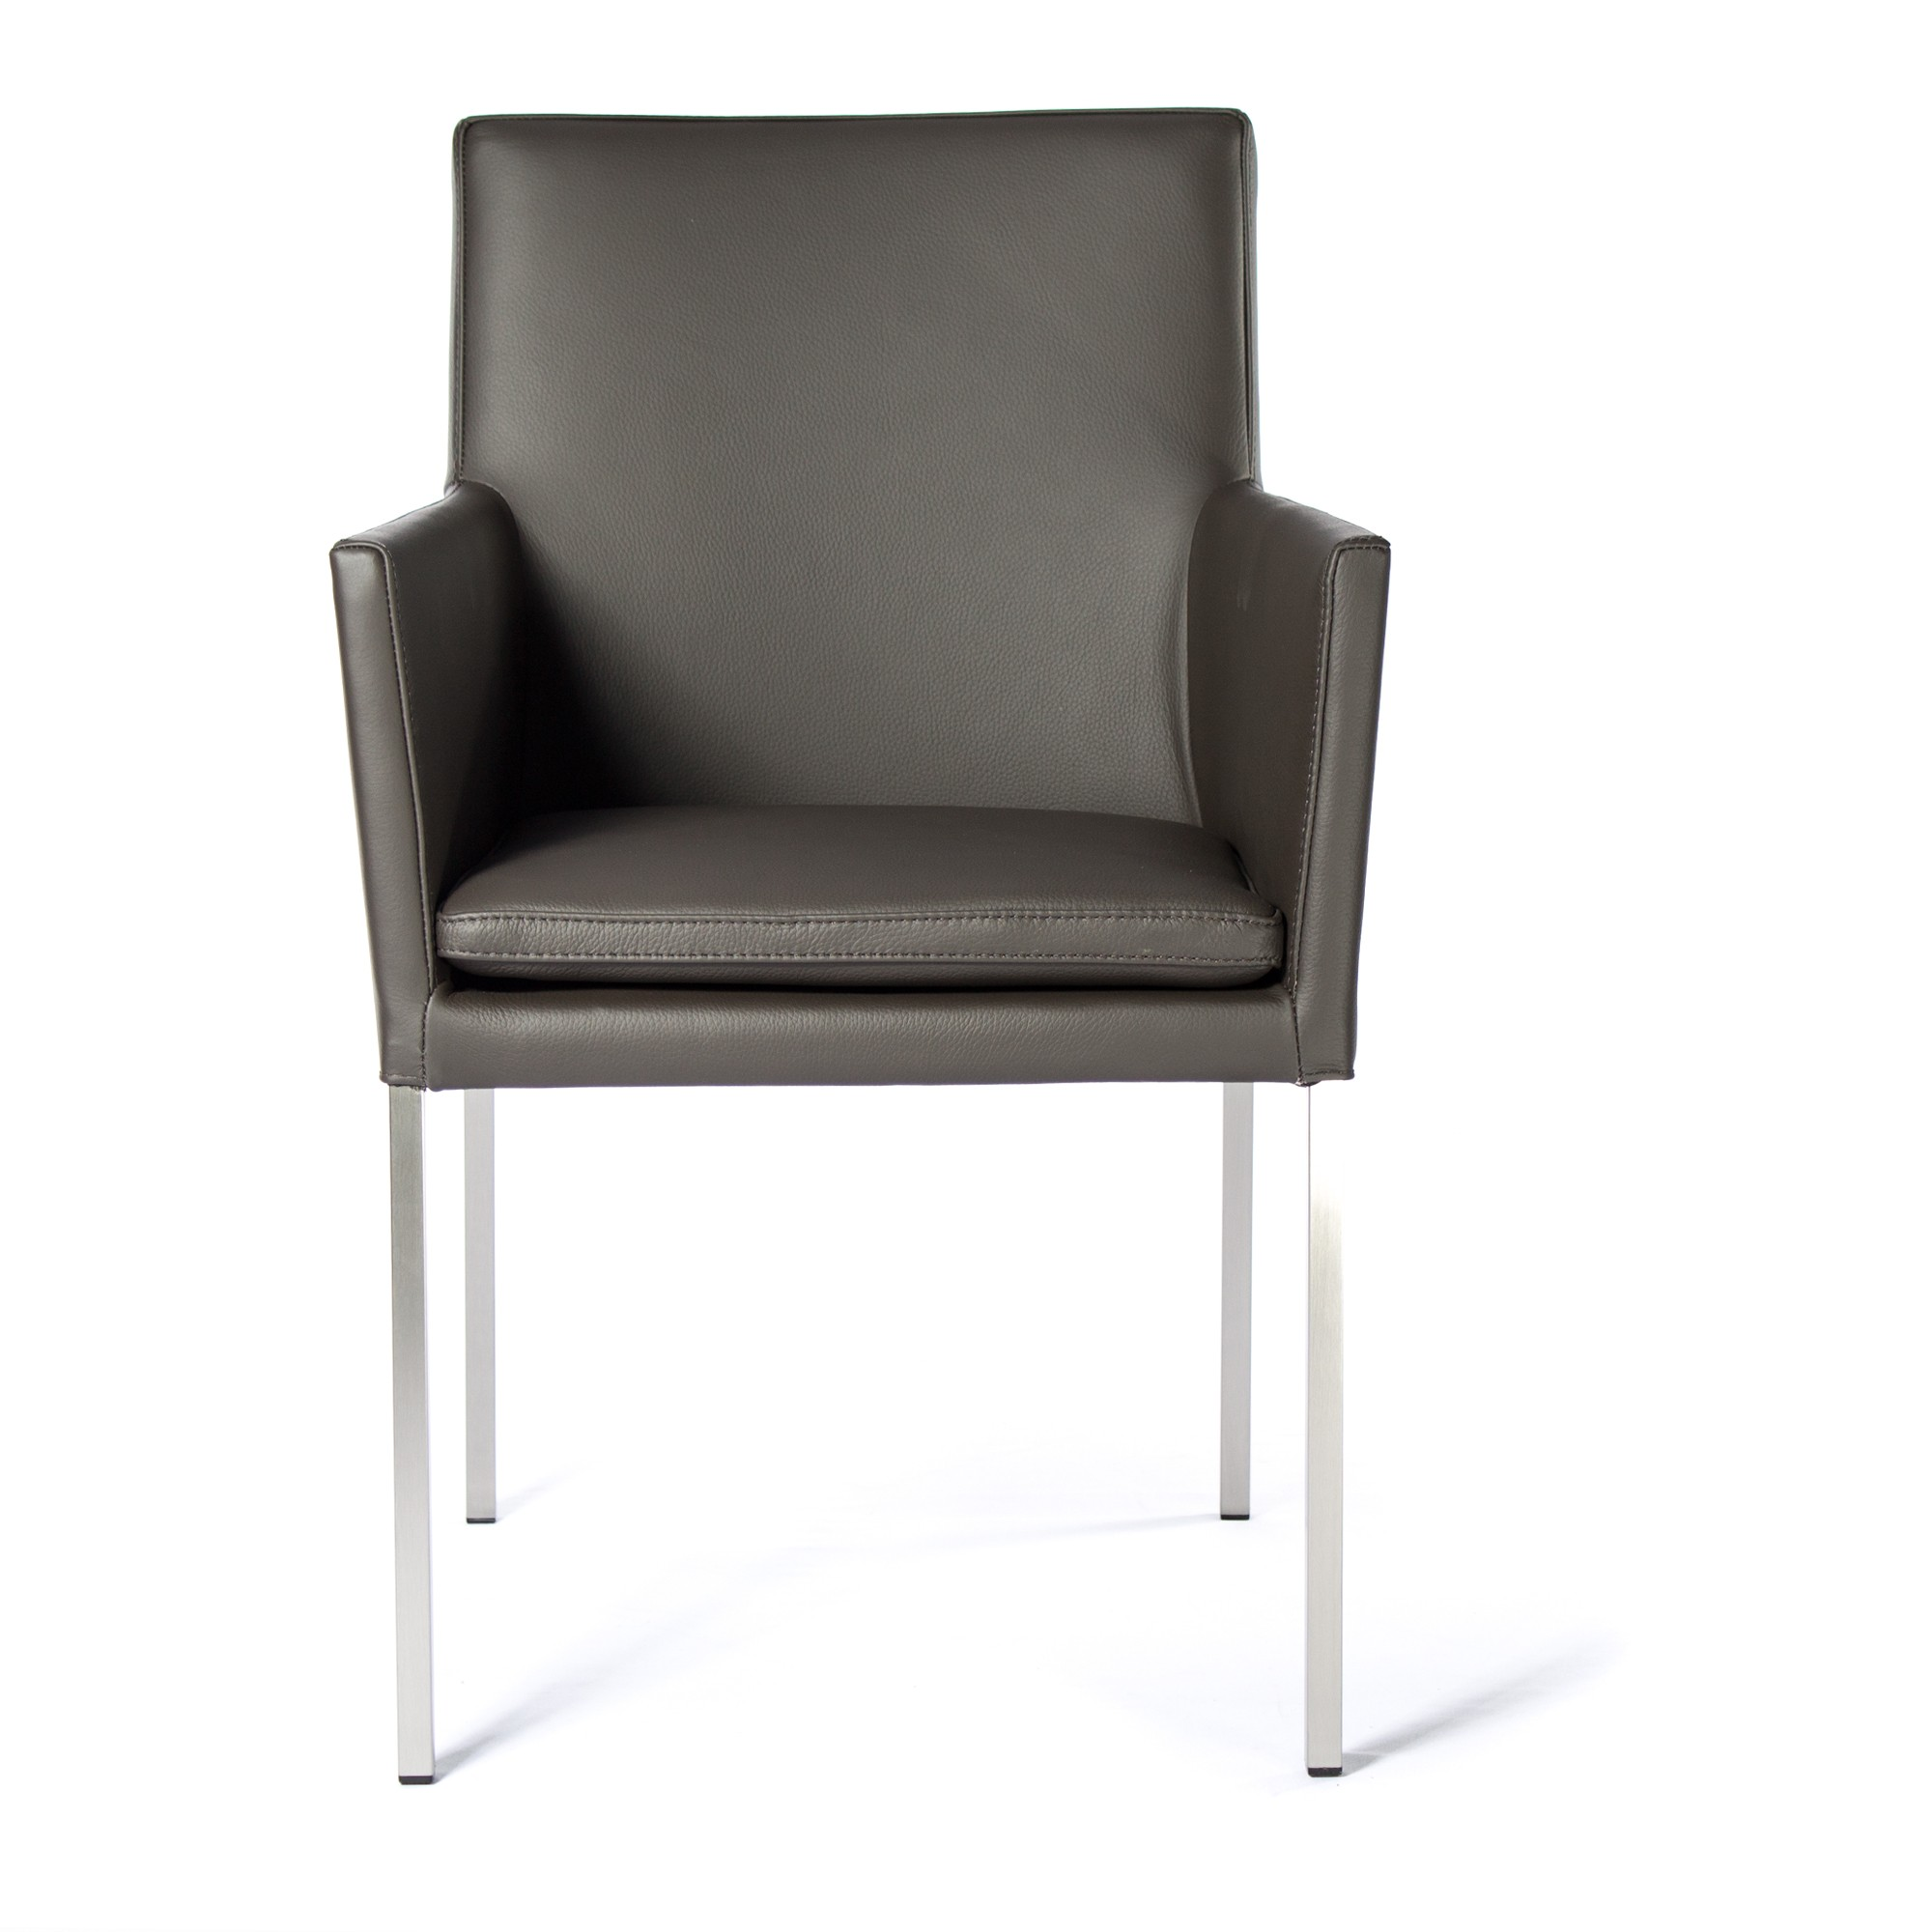 armlehnstuhl lederstuhl ledersessel stella dark braun. Black Bedroom Furniture Sets. Home Design Ideas